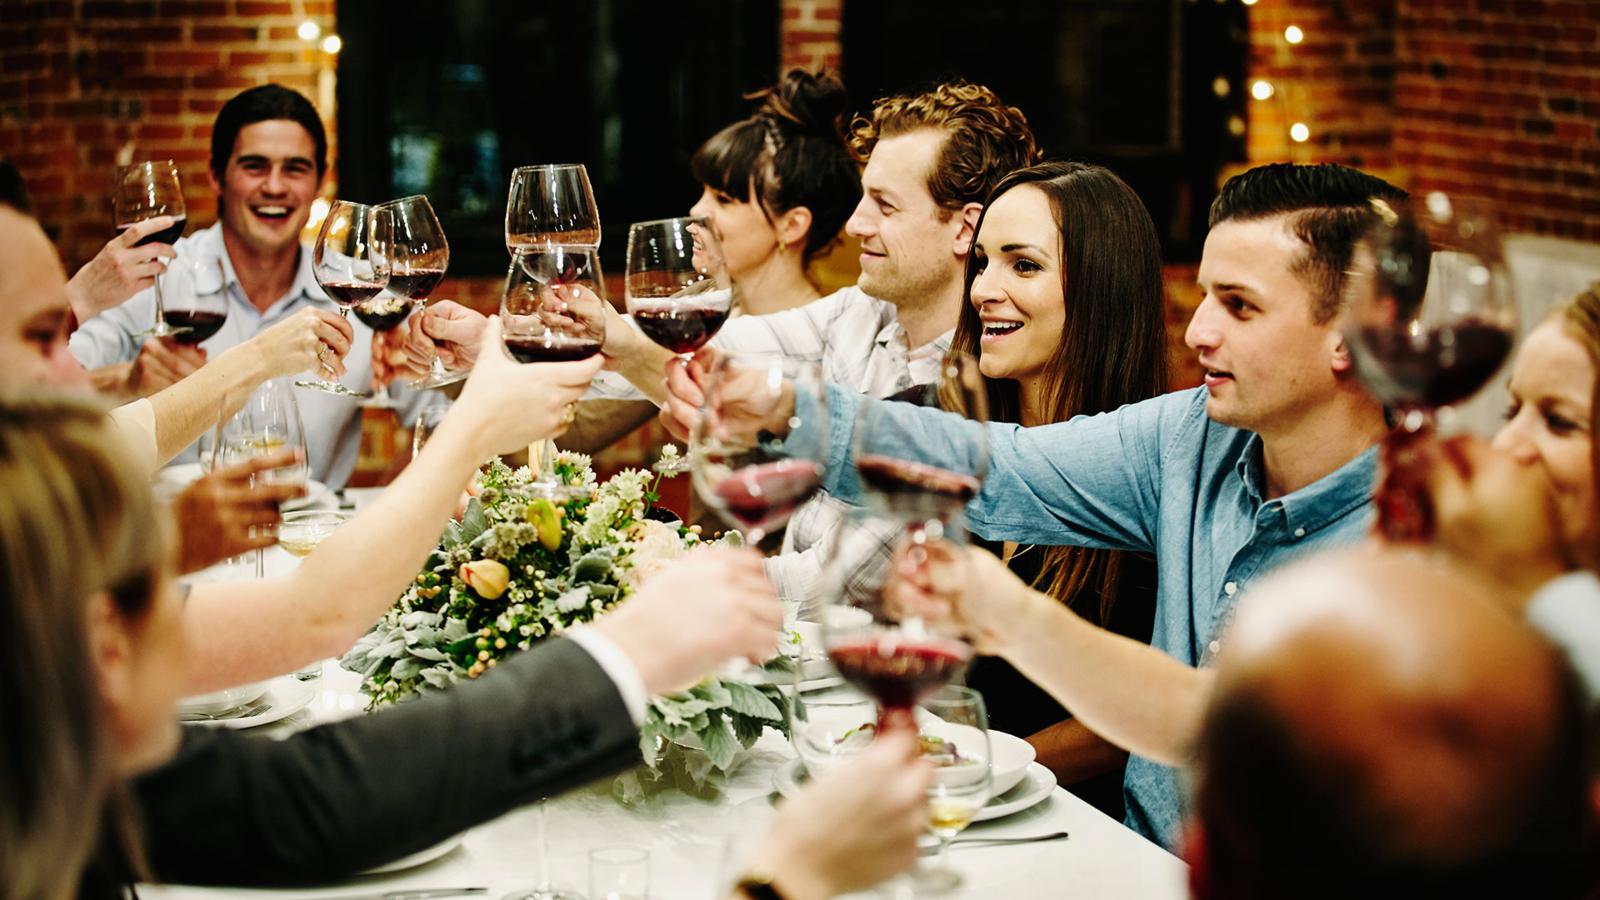 Картинки ужин с друзьями